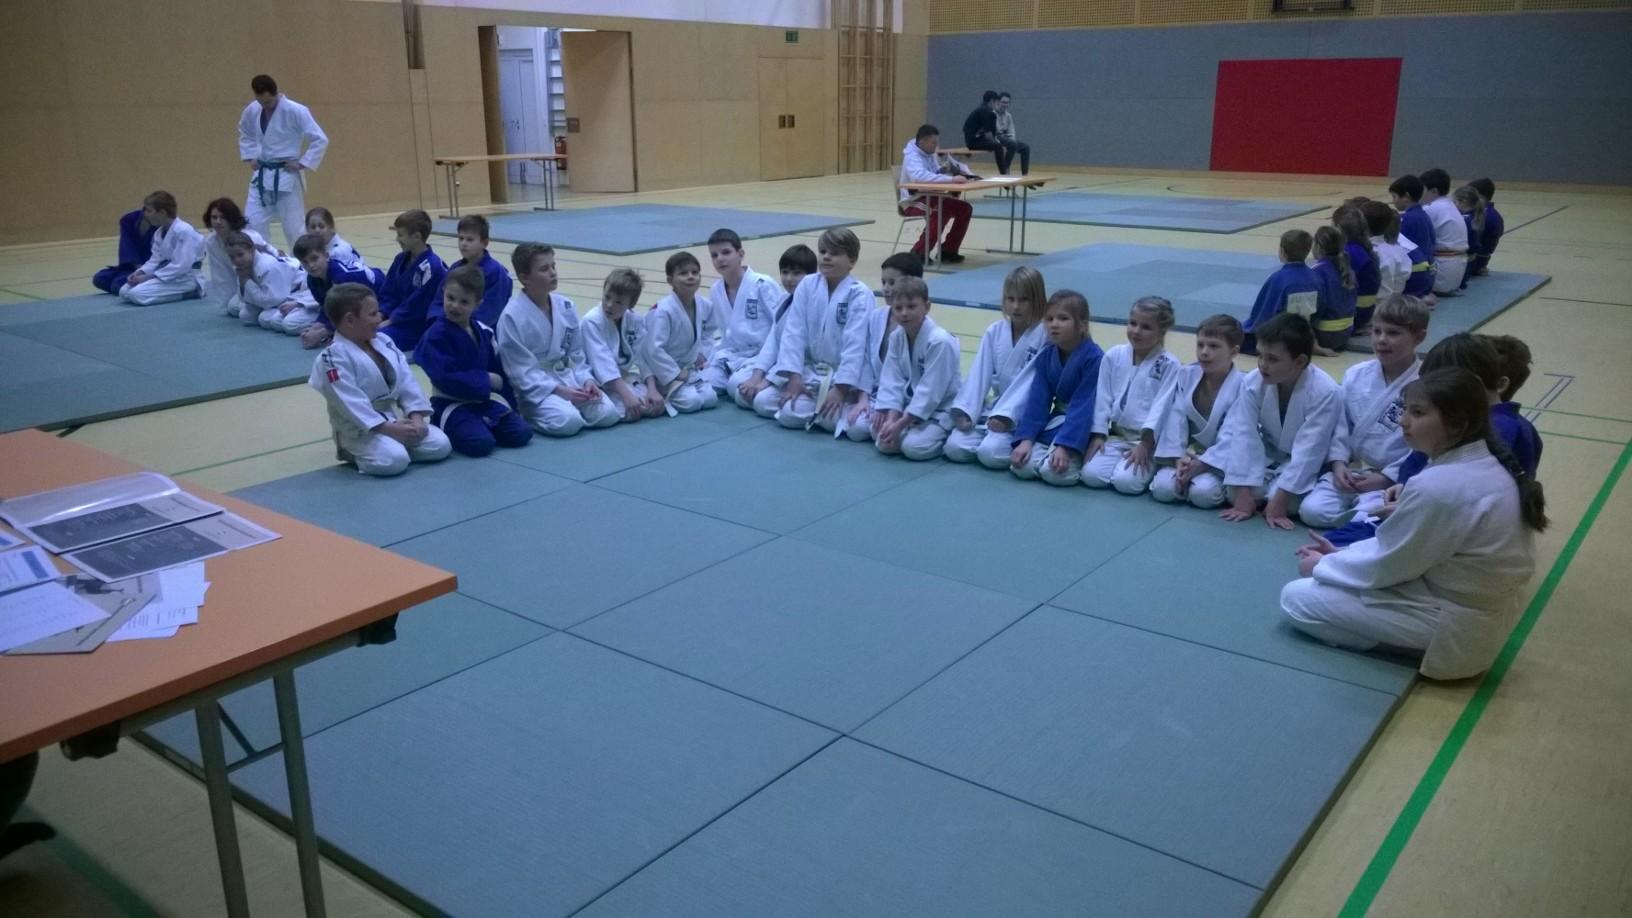 Kyu Prüfung am 30.12.16 in Kirchham